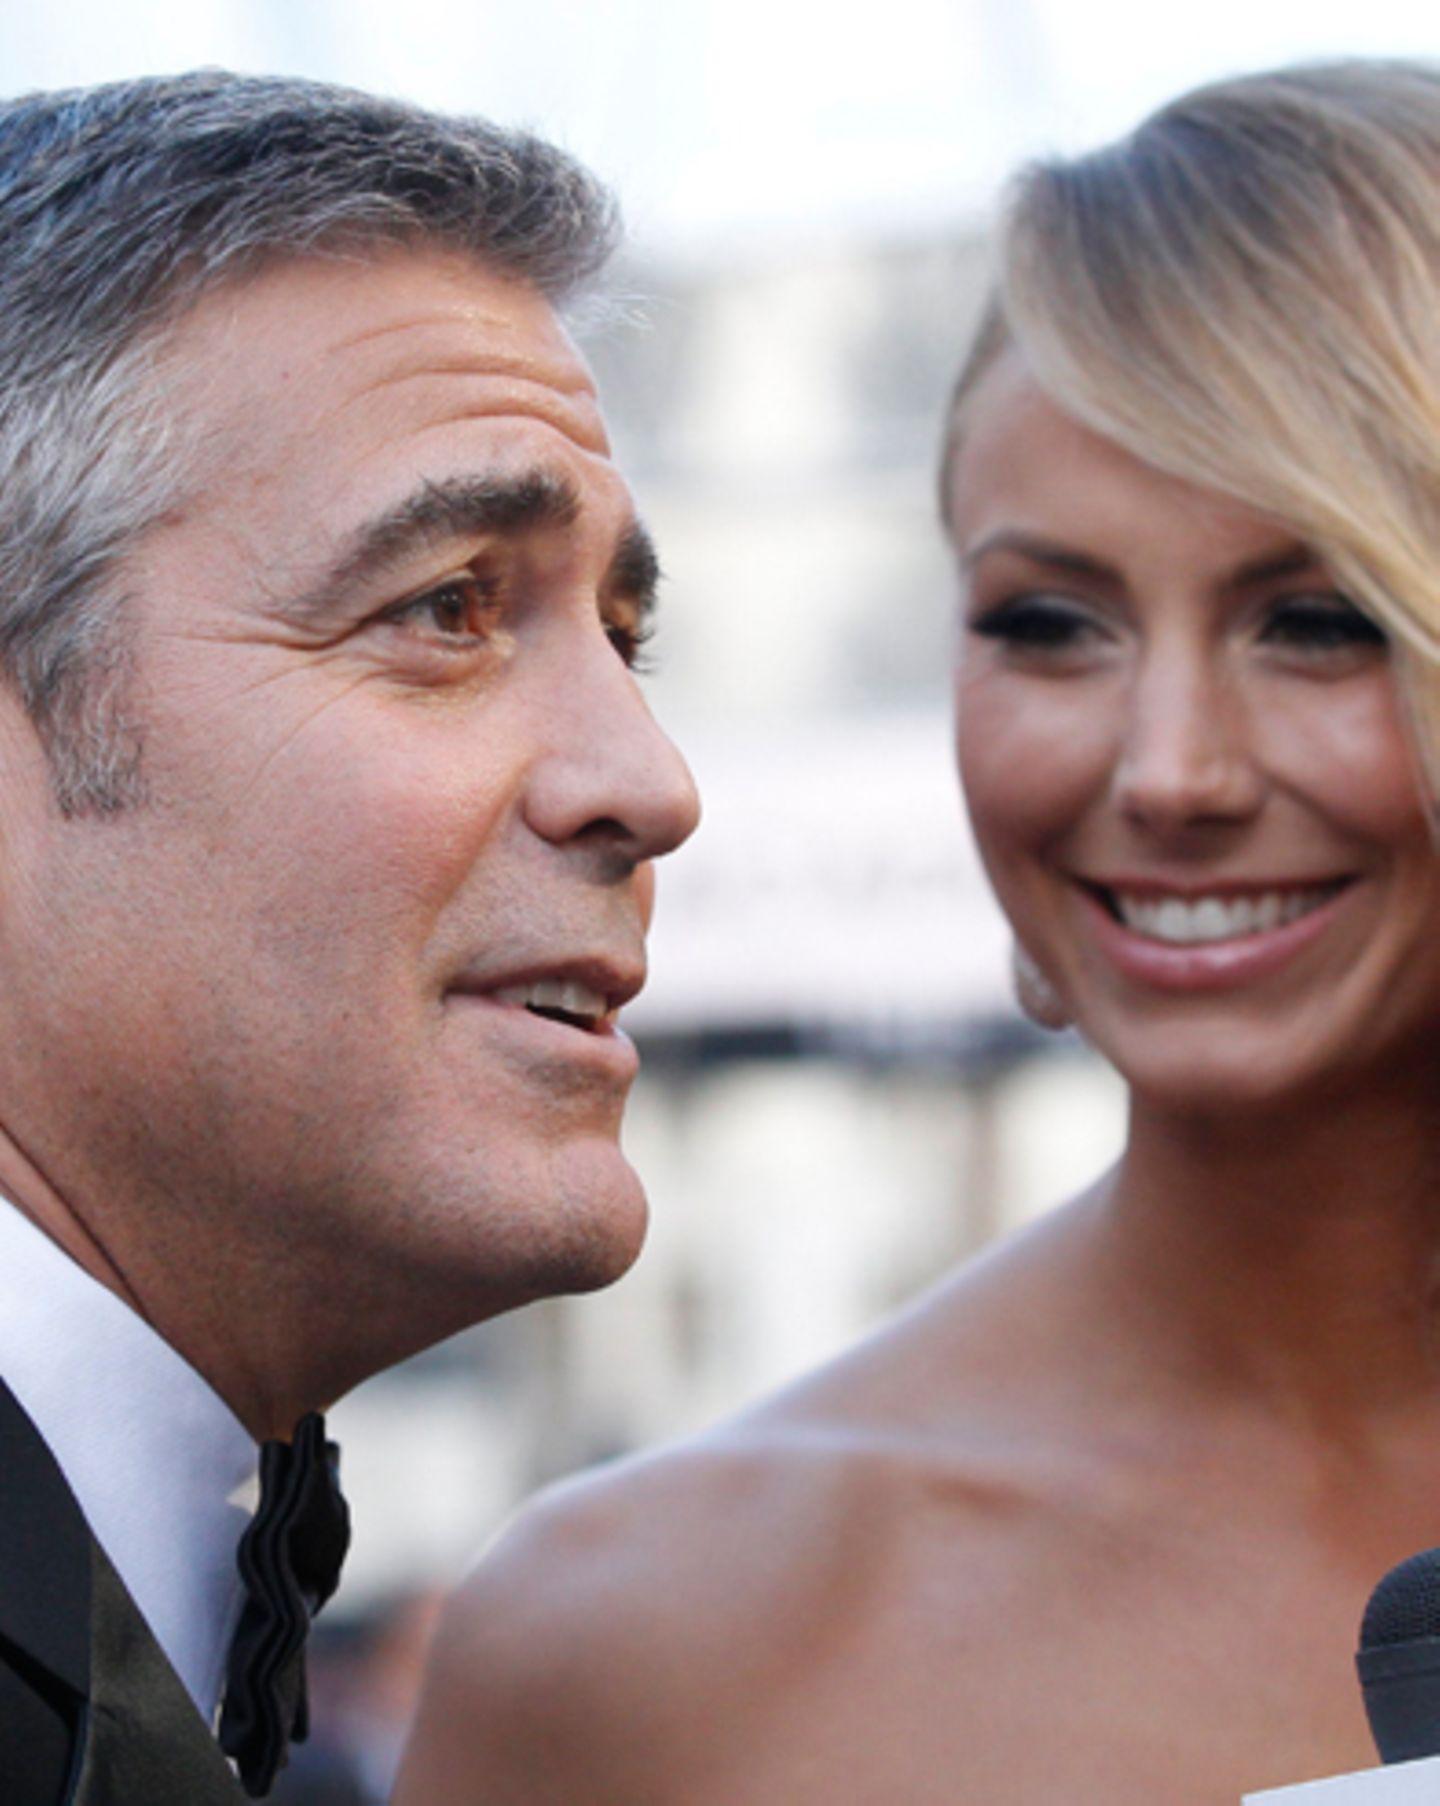 George Clooney + Stacy Keibler